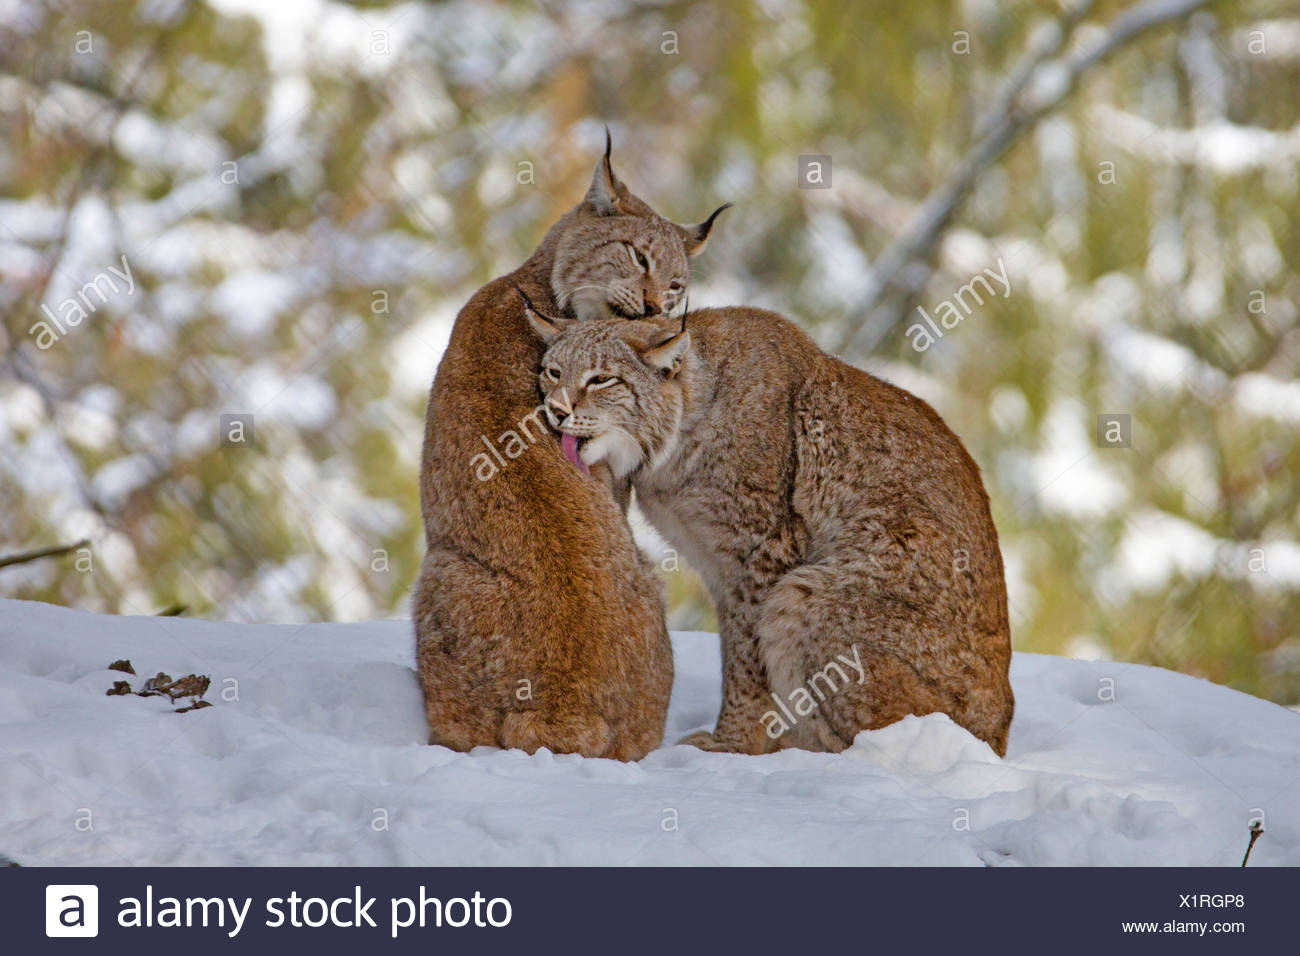 Bobcat (Lynx rufus), coppia toelettatura Immagini Stock